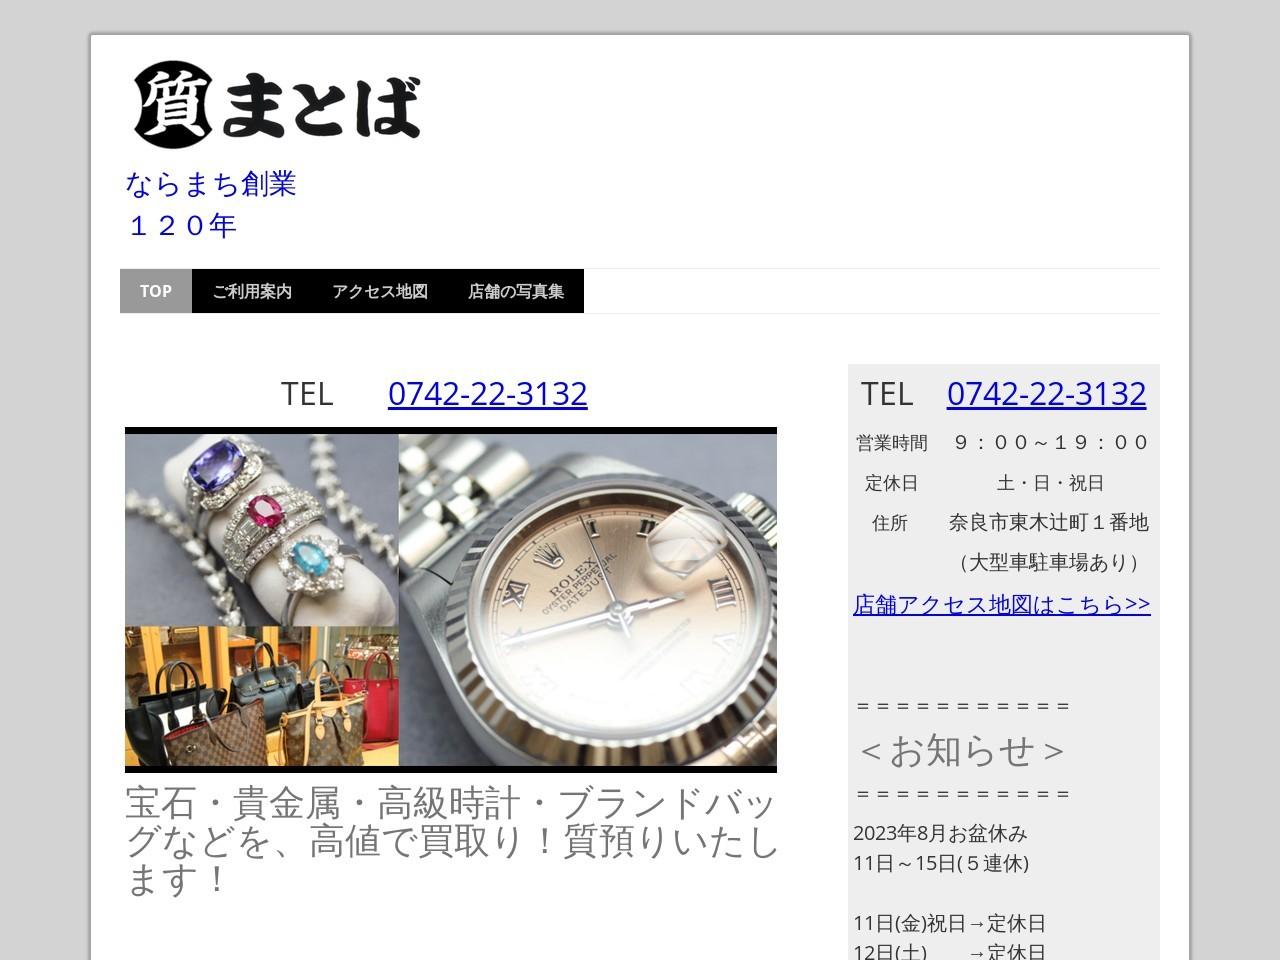 TOP - 質まとば(質屋)|誠実第一!奈良の老舗 買取査定もお気軽に